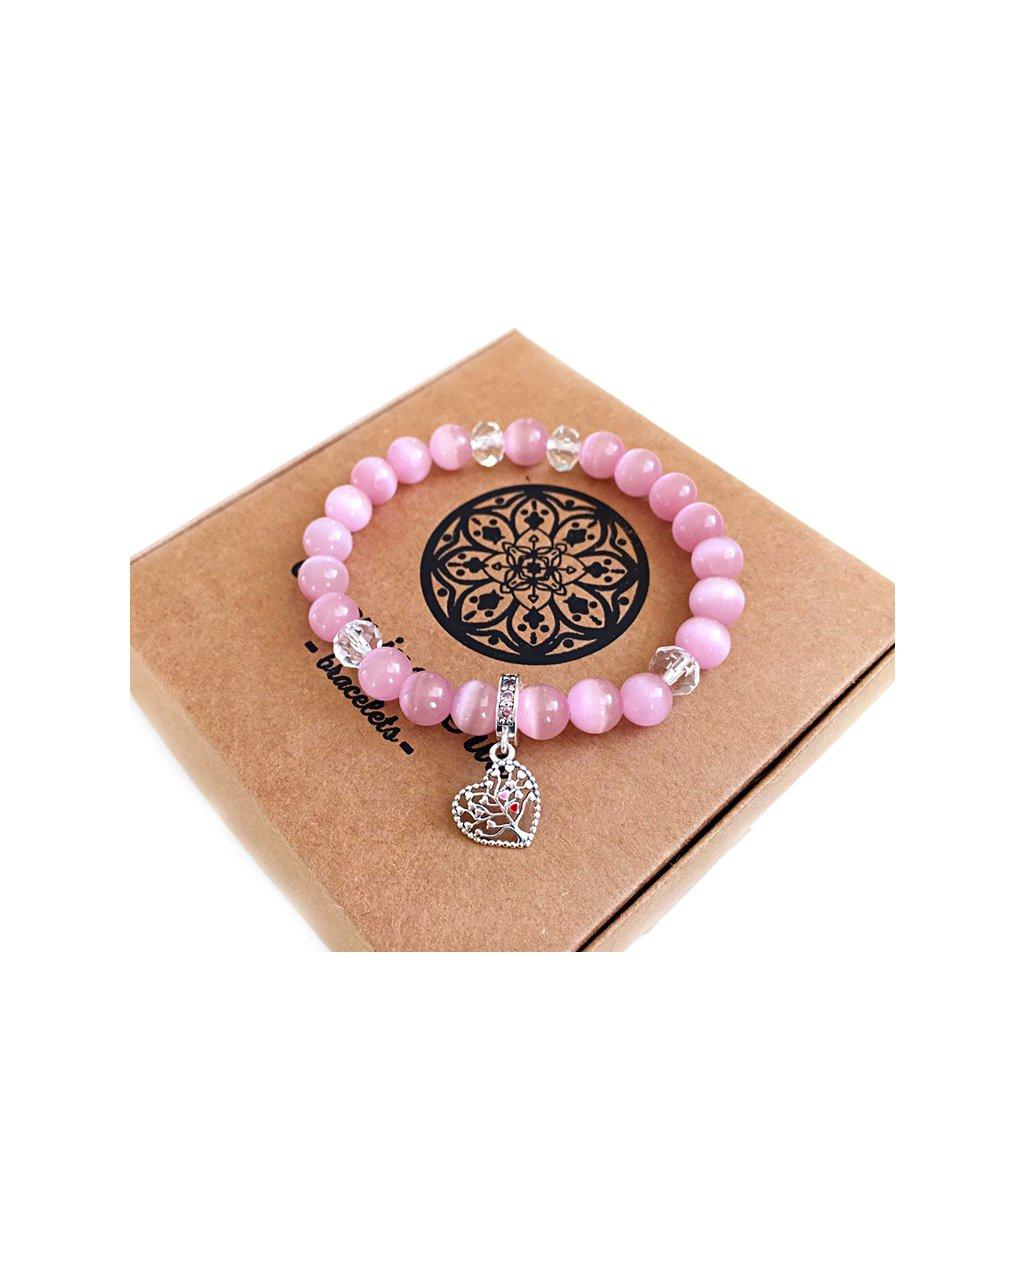 Náramek z minerálu růžový opál a srdíčko se stromem života